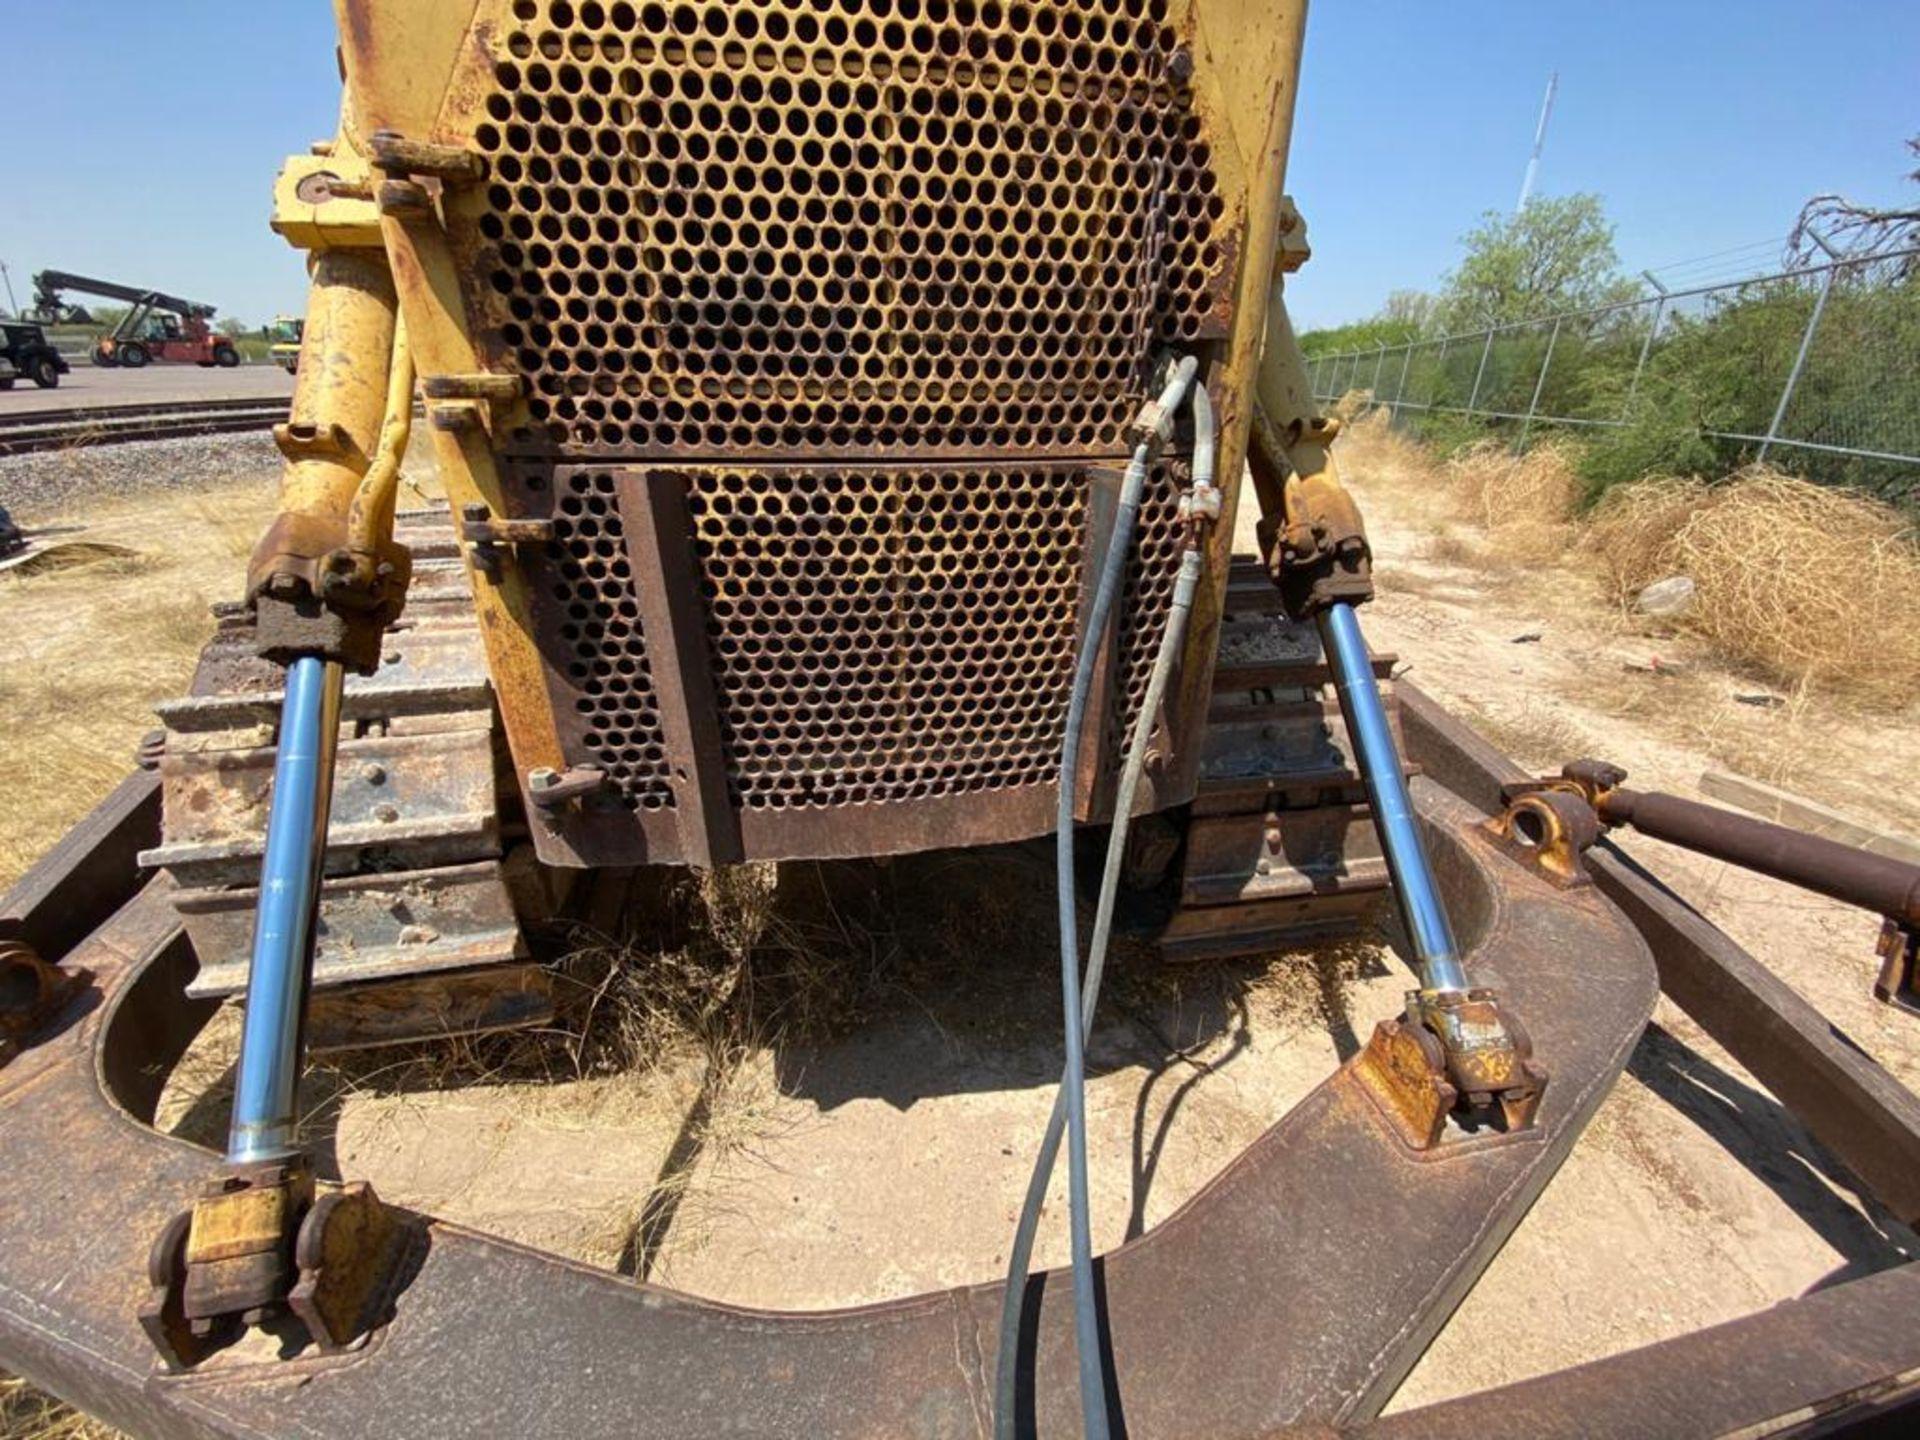 Caterpillar D7G Bulldozer, Serial number 92V5897, Diesel motor - Image 21 of 48